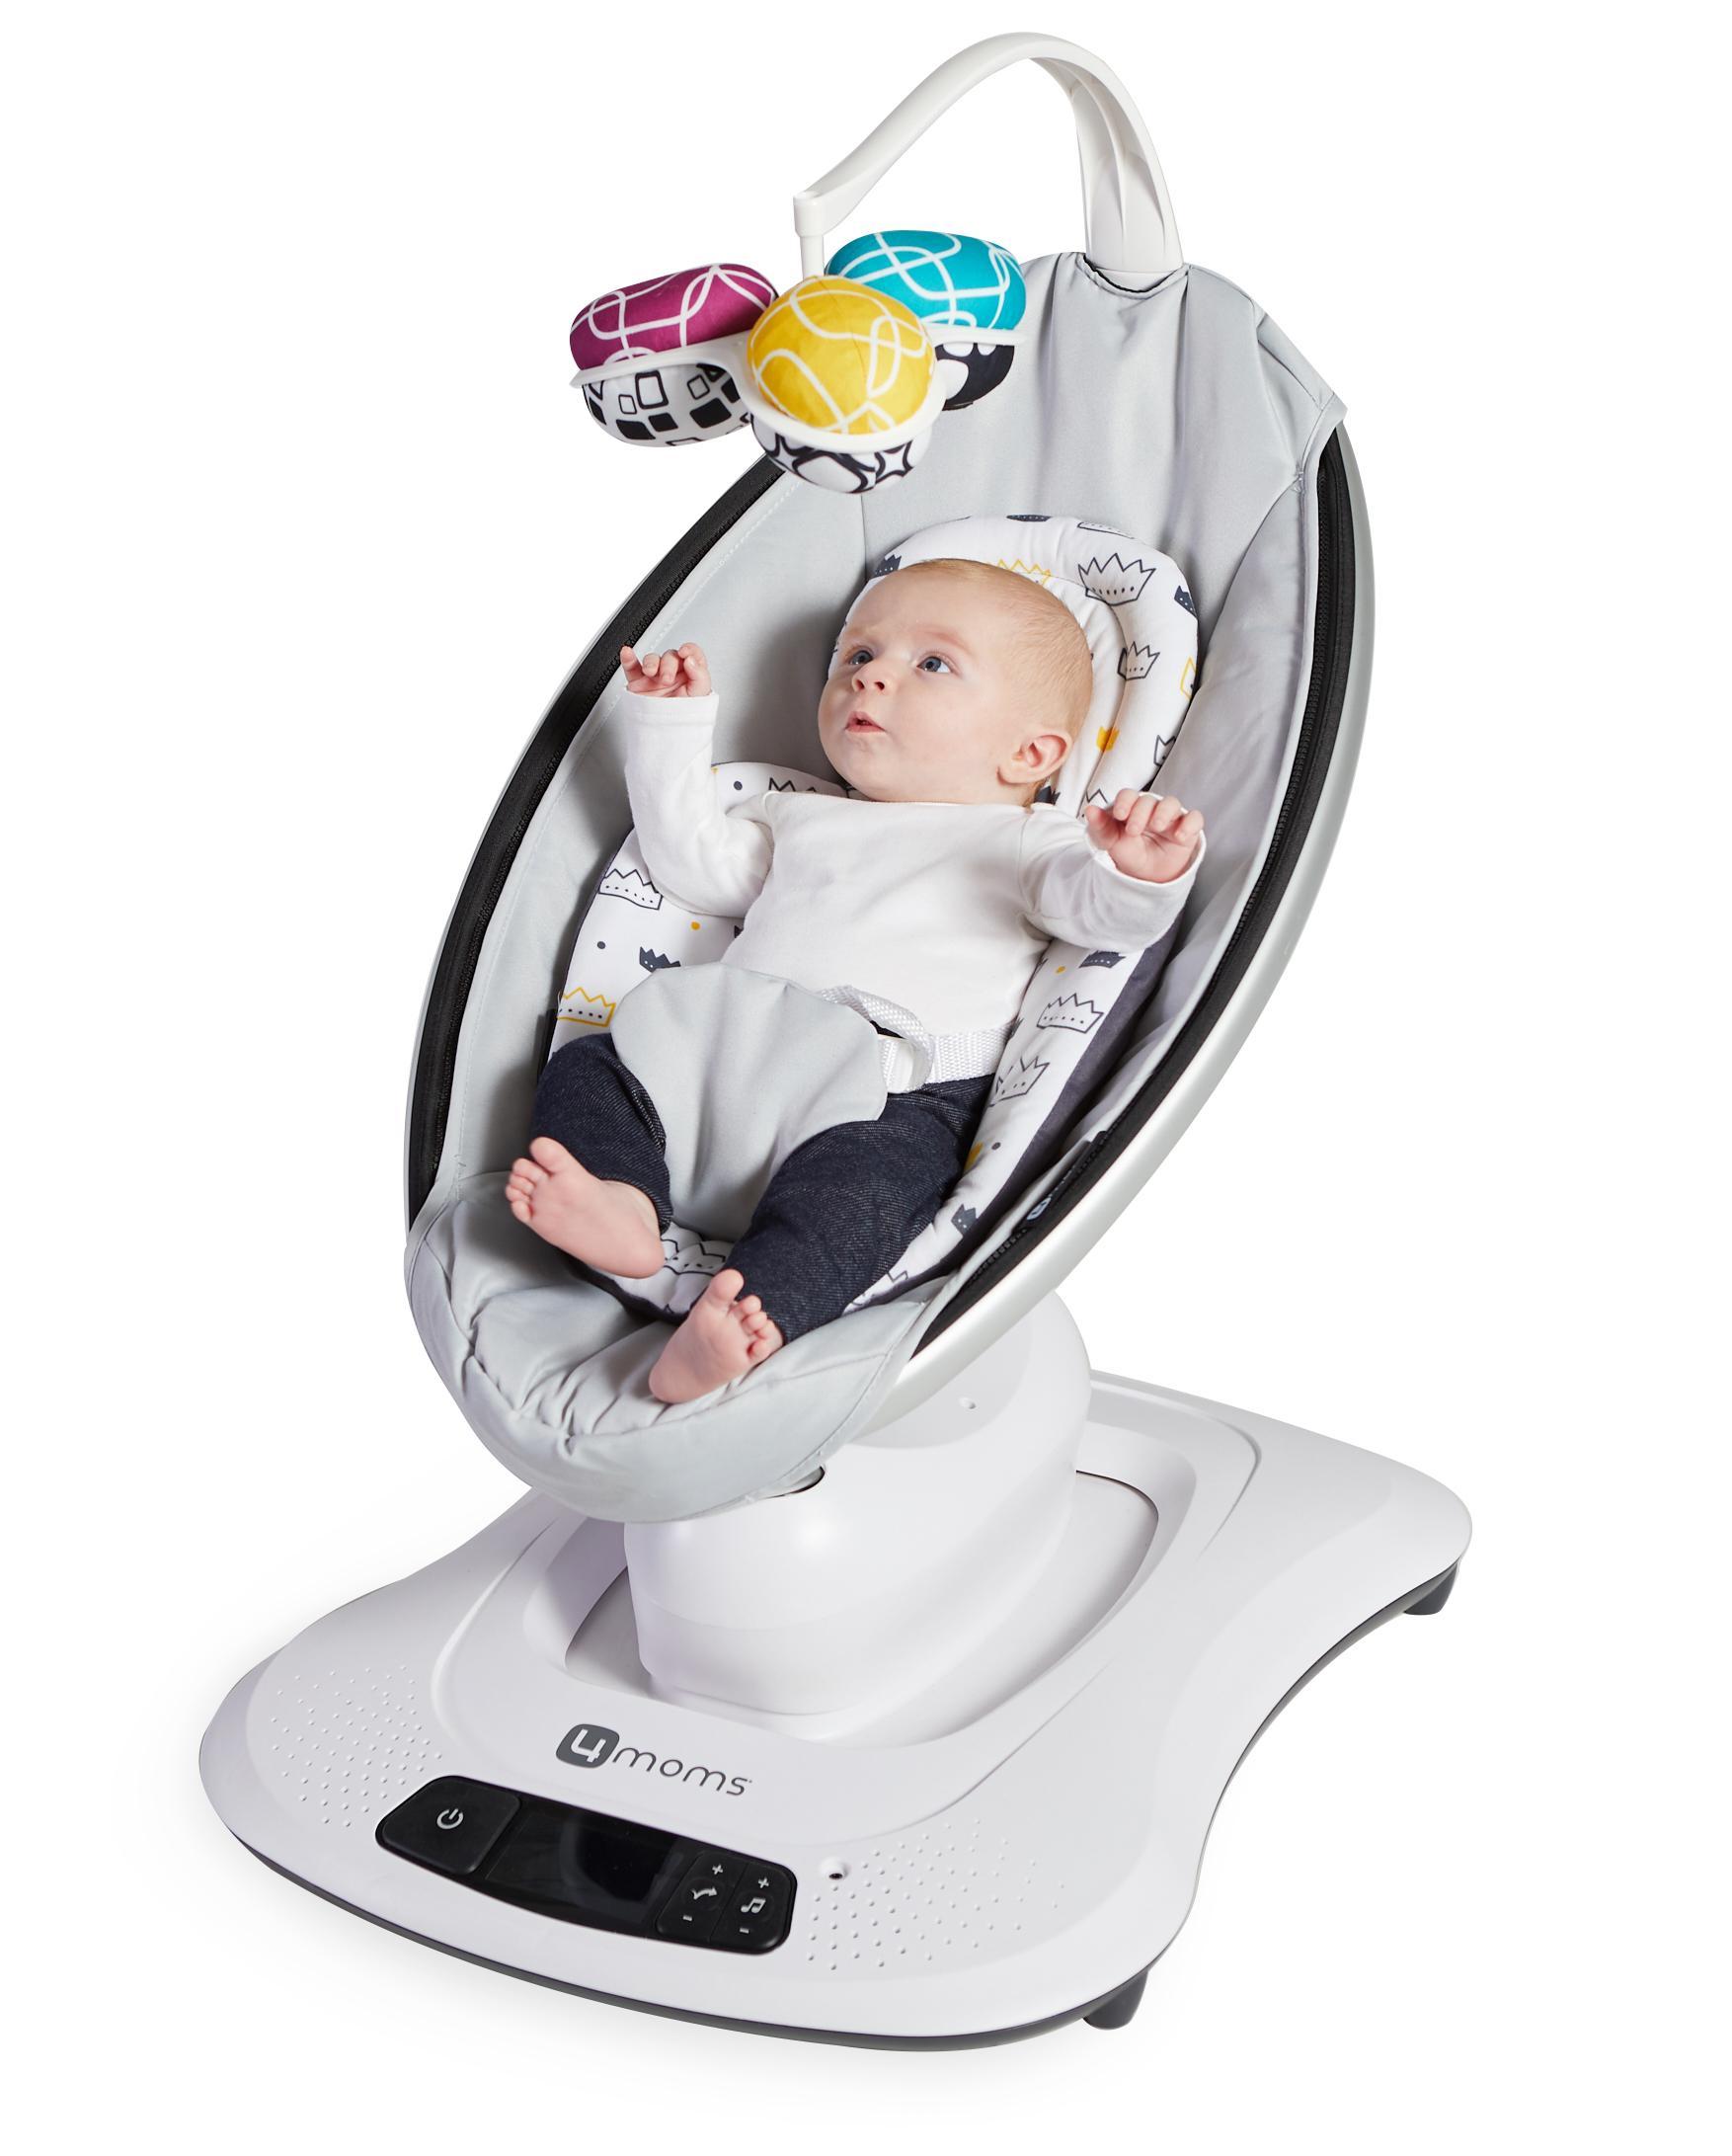 4moms mamaRoo Reversible Newborn Insert, Limited Edition Royal Baby